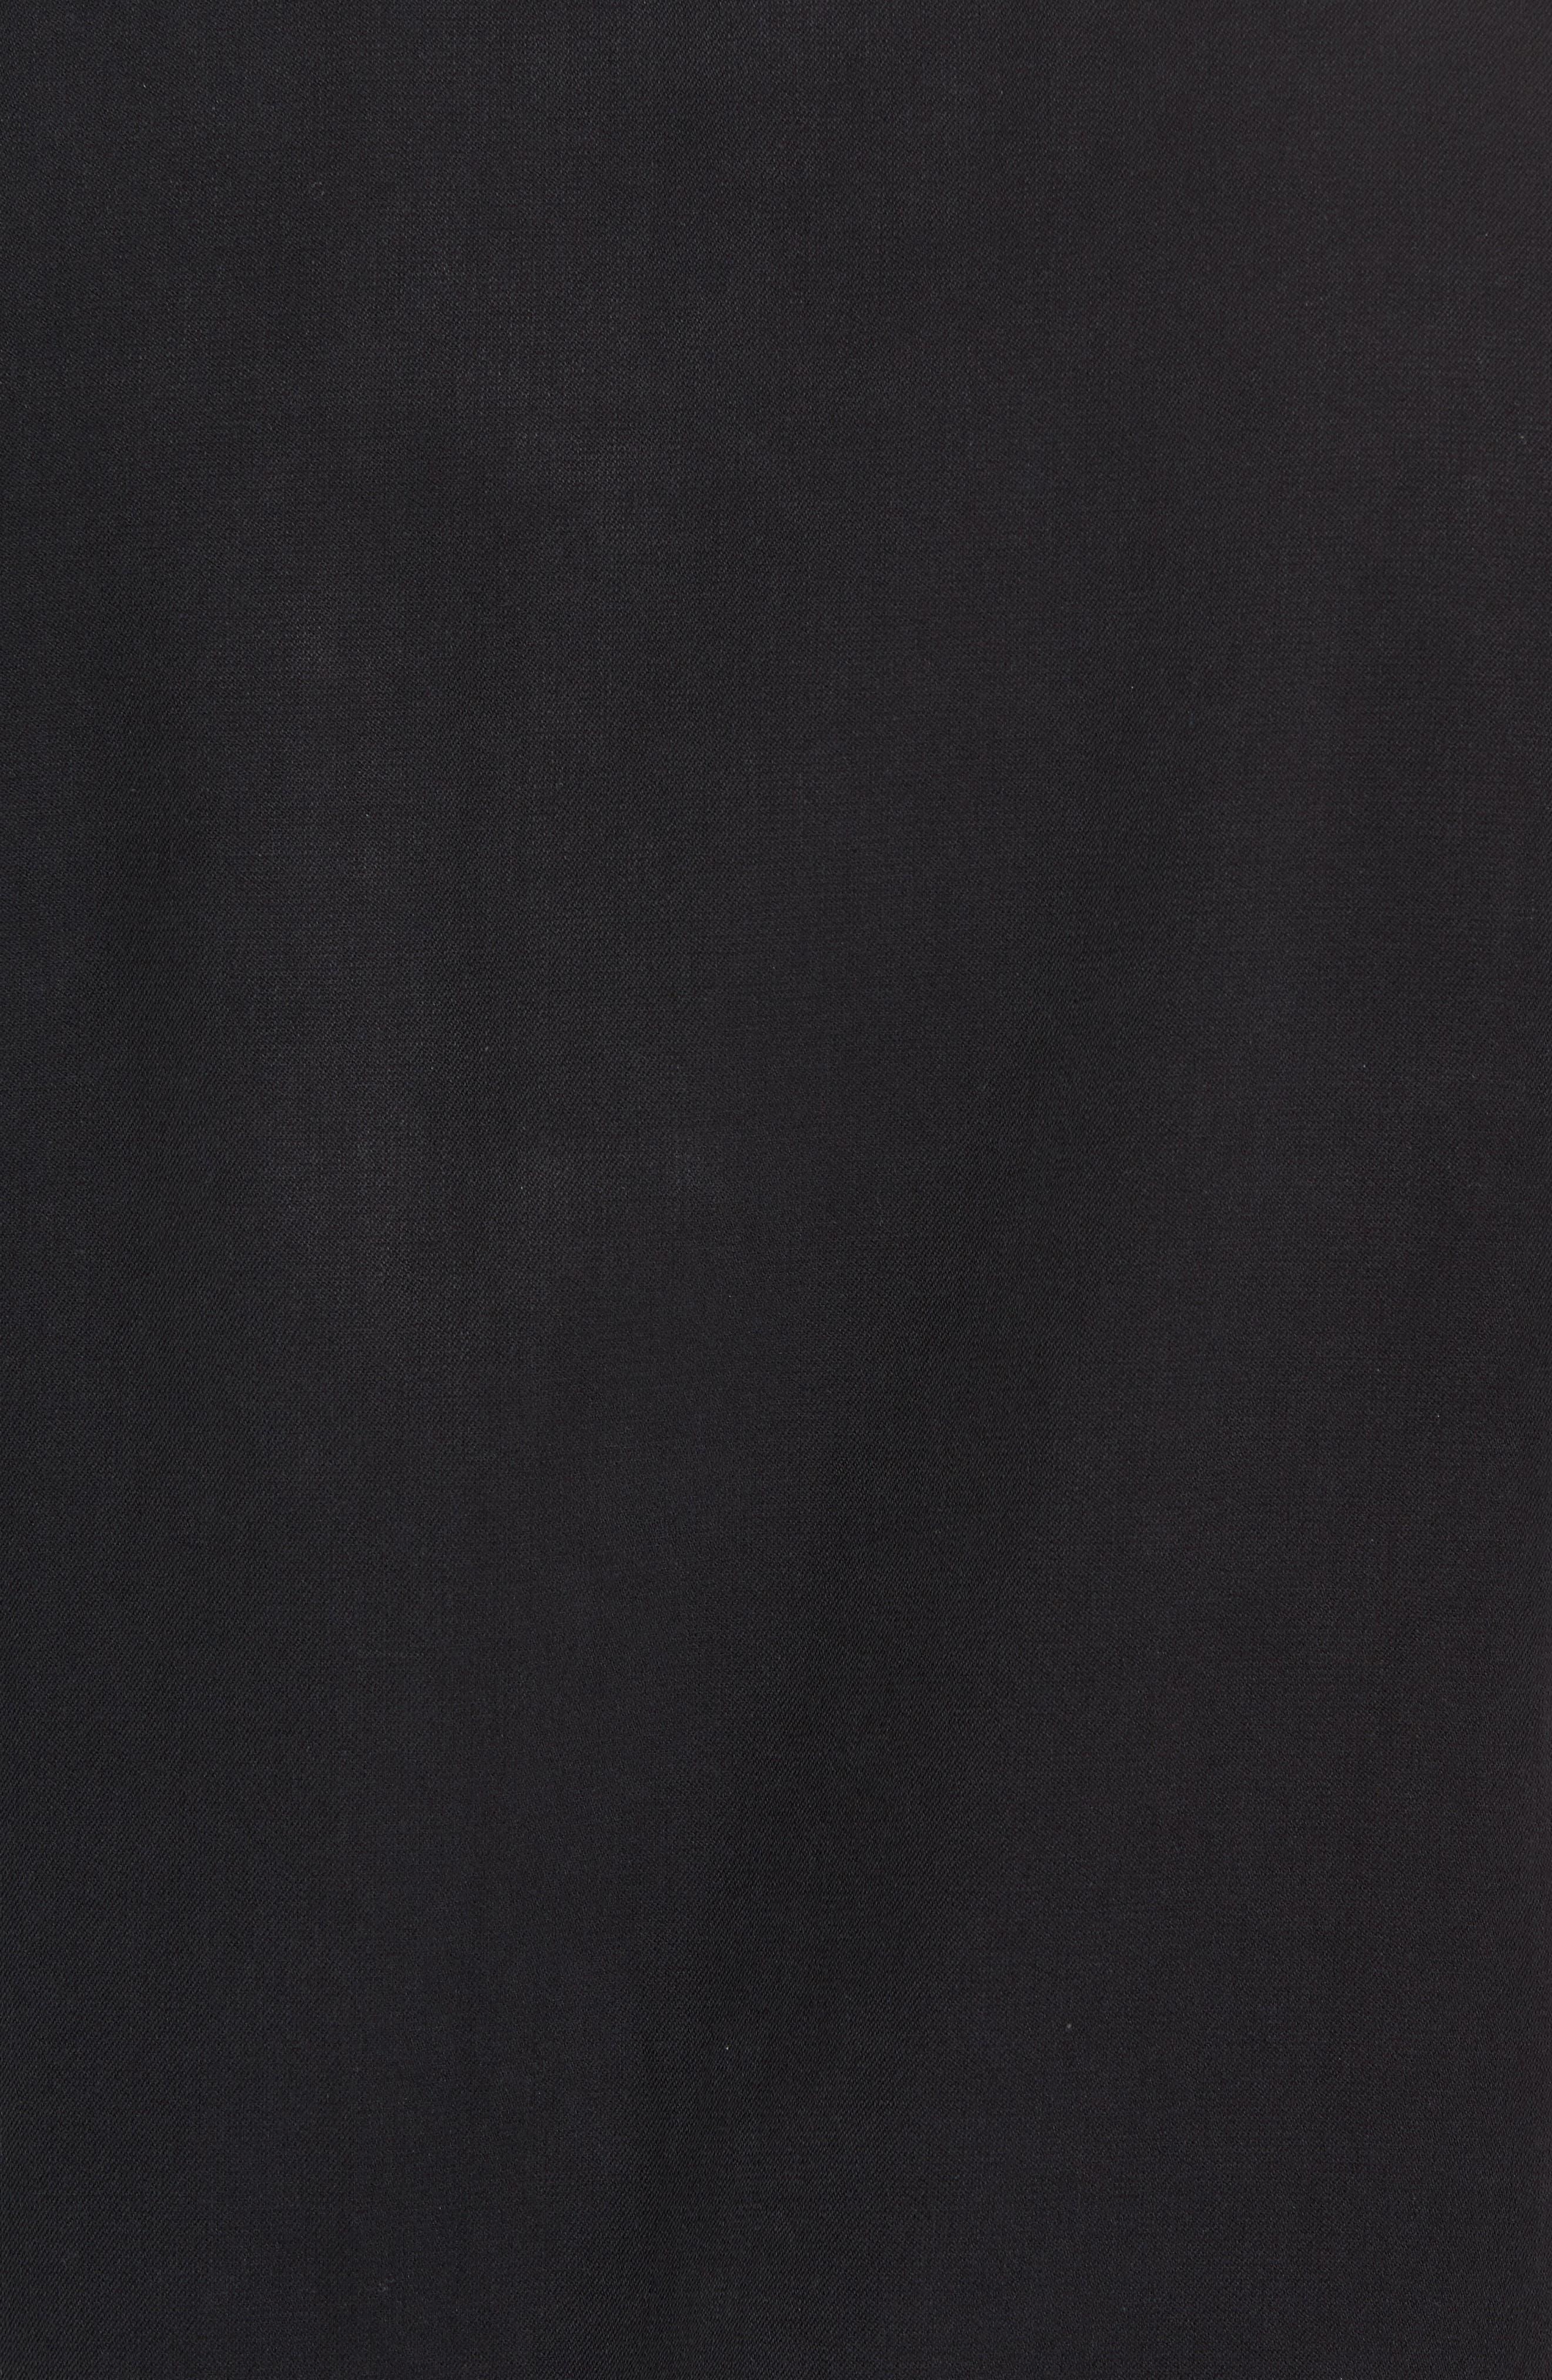 Black Diamond Regular Fit Embroidered Silk Blend Sport Shirt,                             Alternate thumbnail 5, color,                             Black